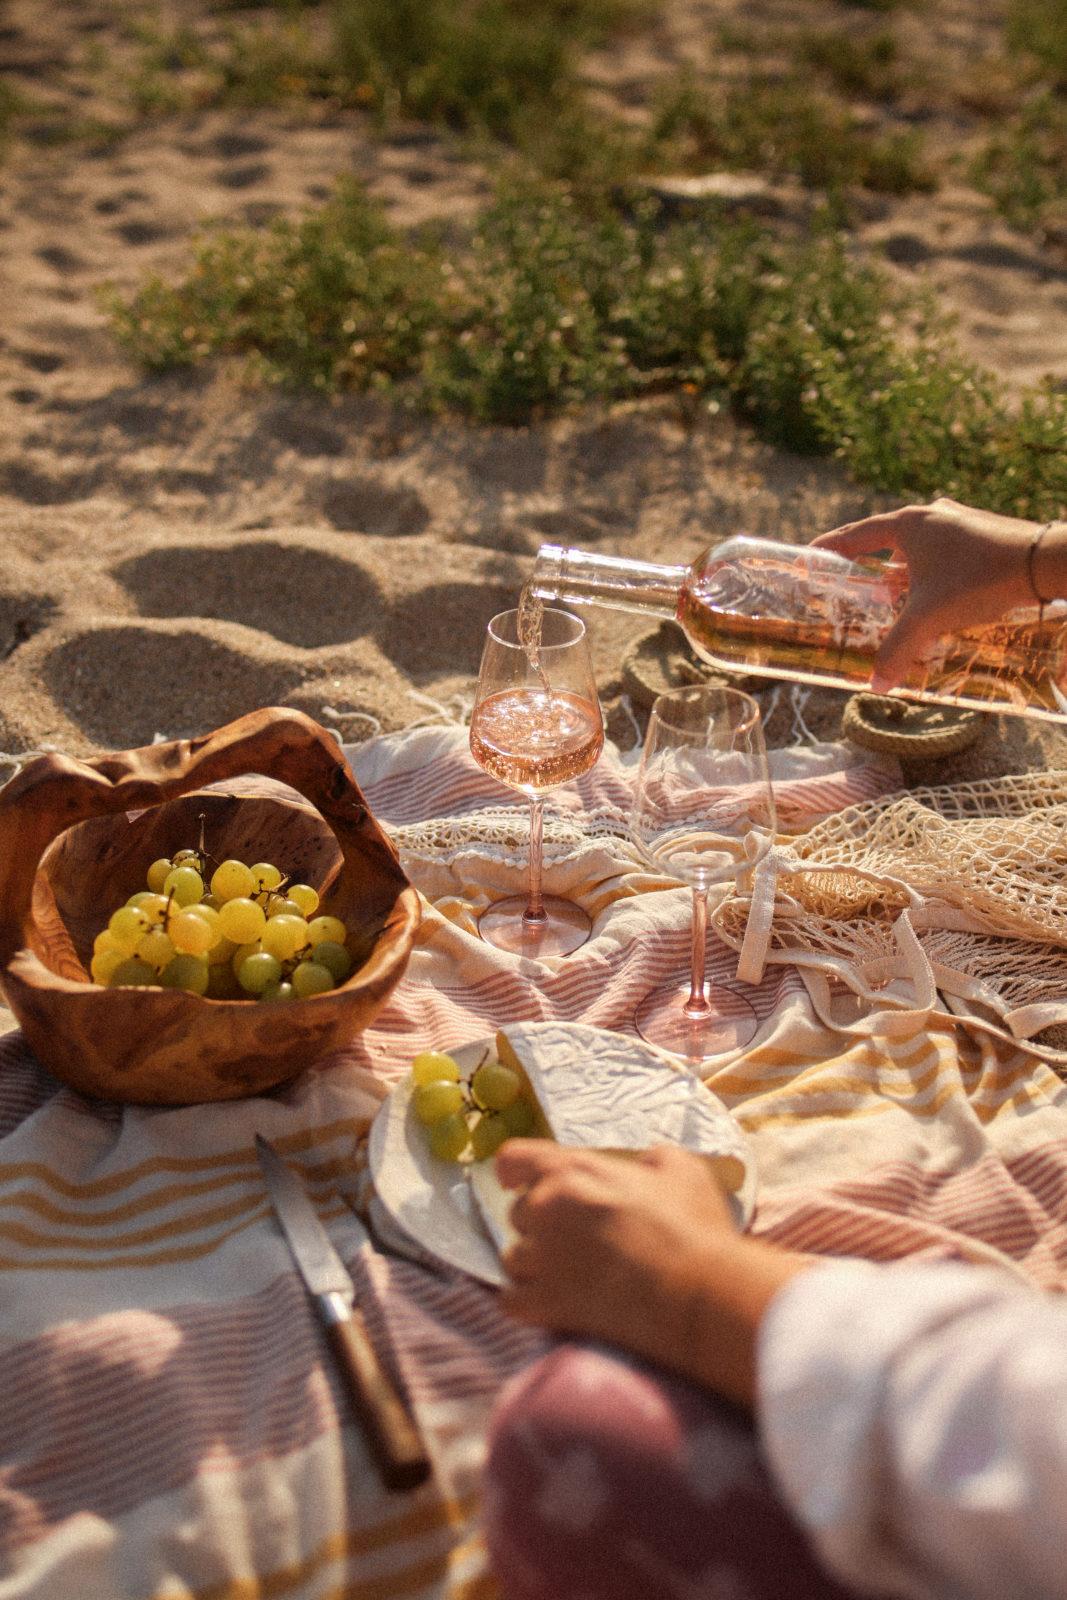 Picnic en la playa con vino rosado